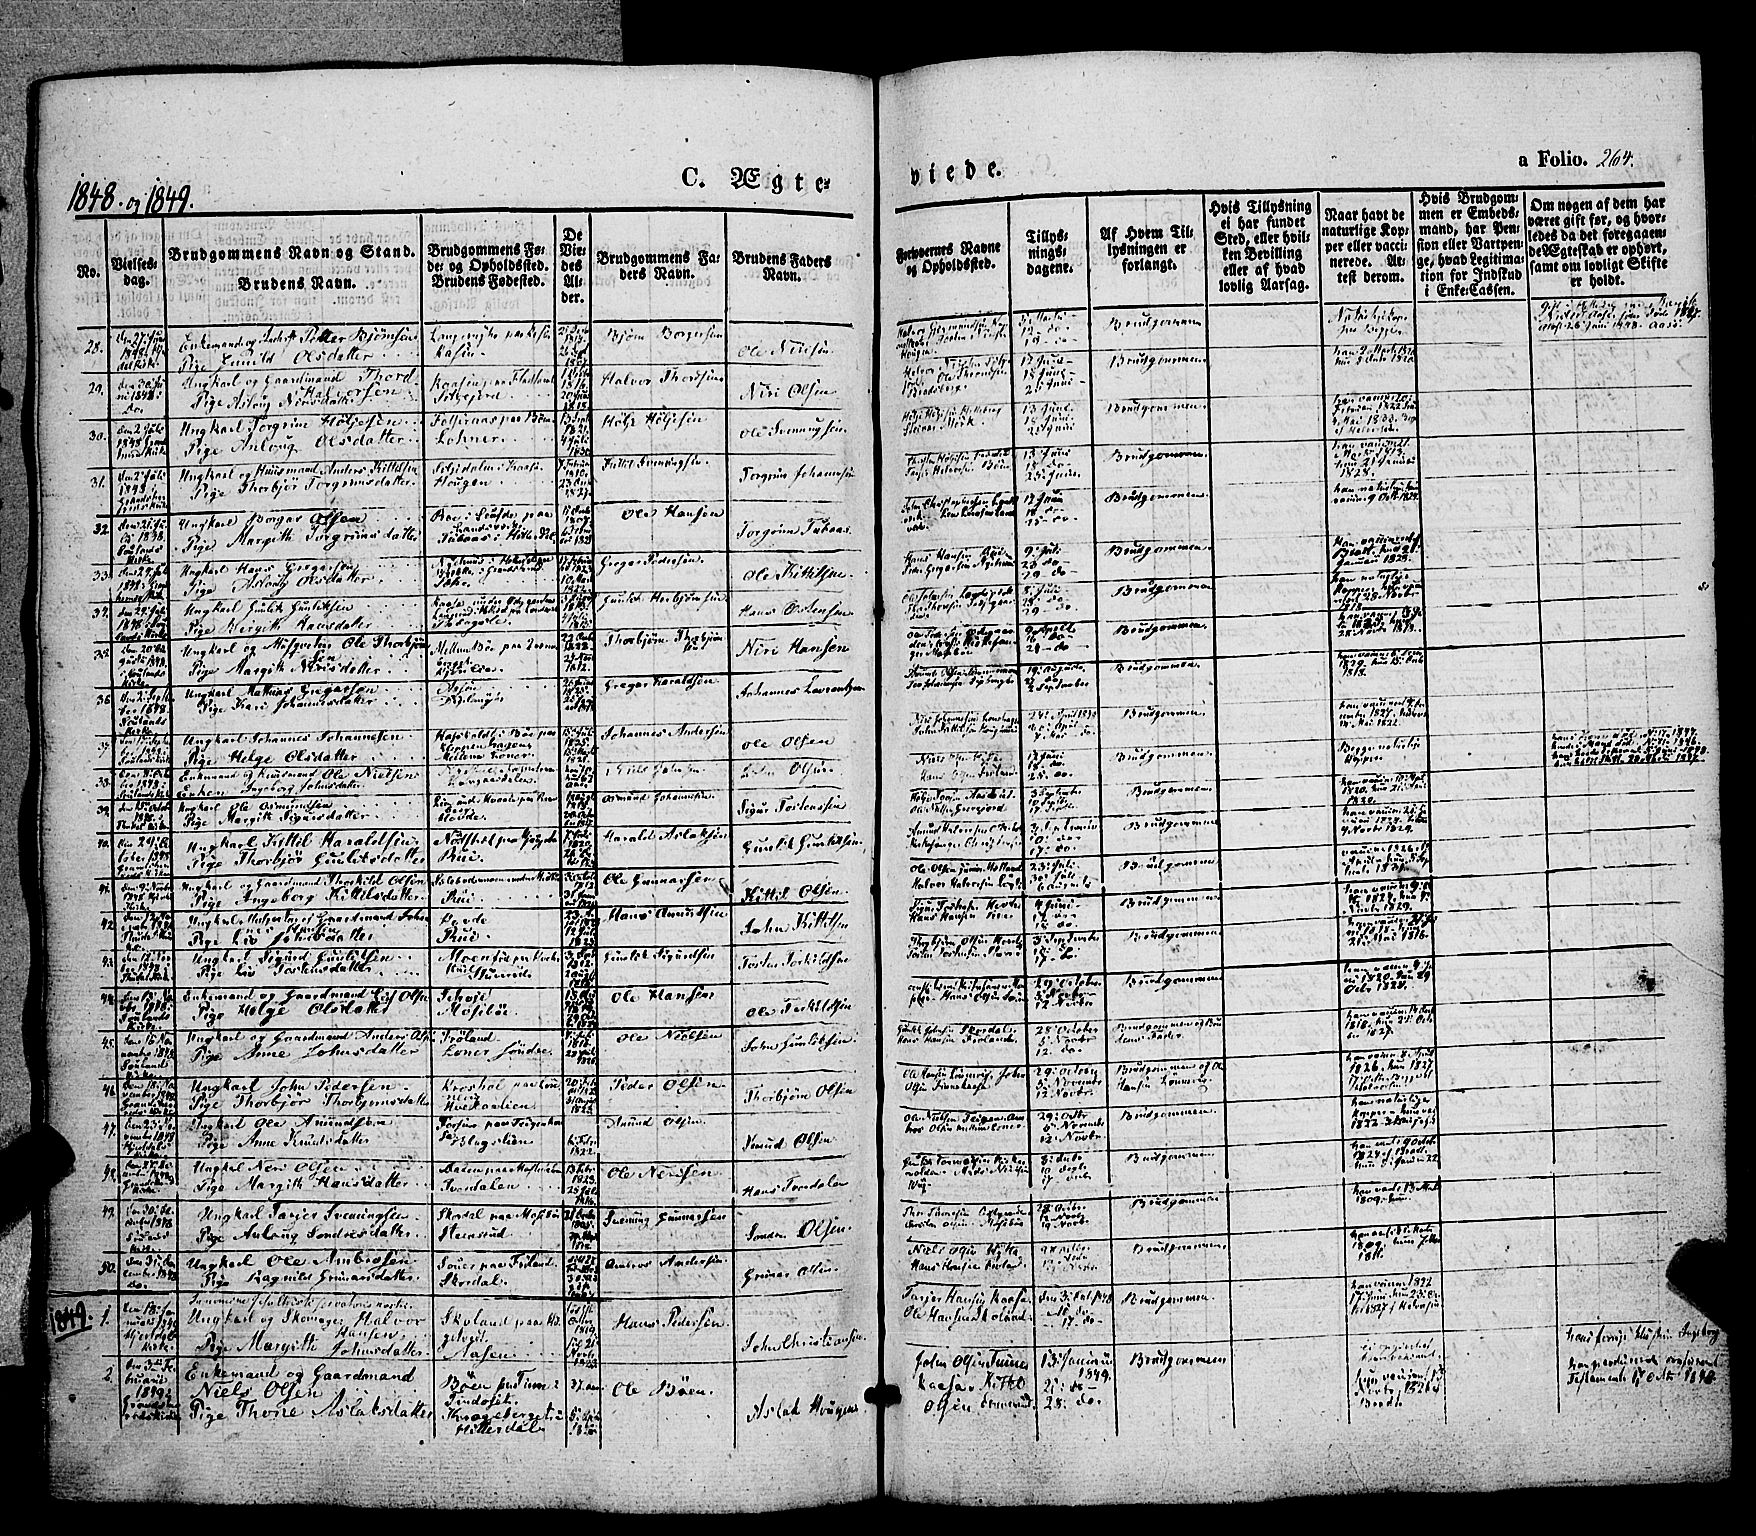 SAKO, Hjartdal kirkebøker, F/Fa/L0008: Ministerialbok nr. I 8, 1844-1859, s. 264